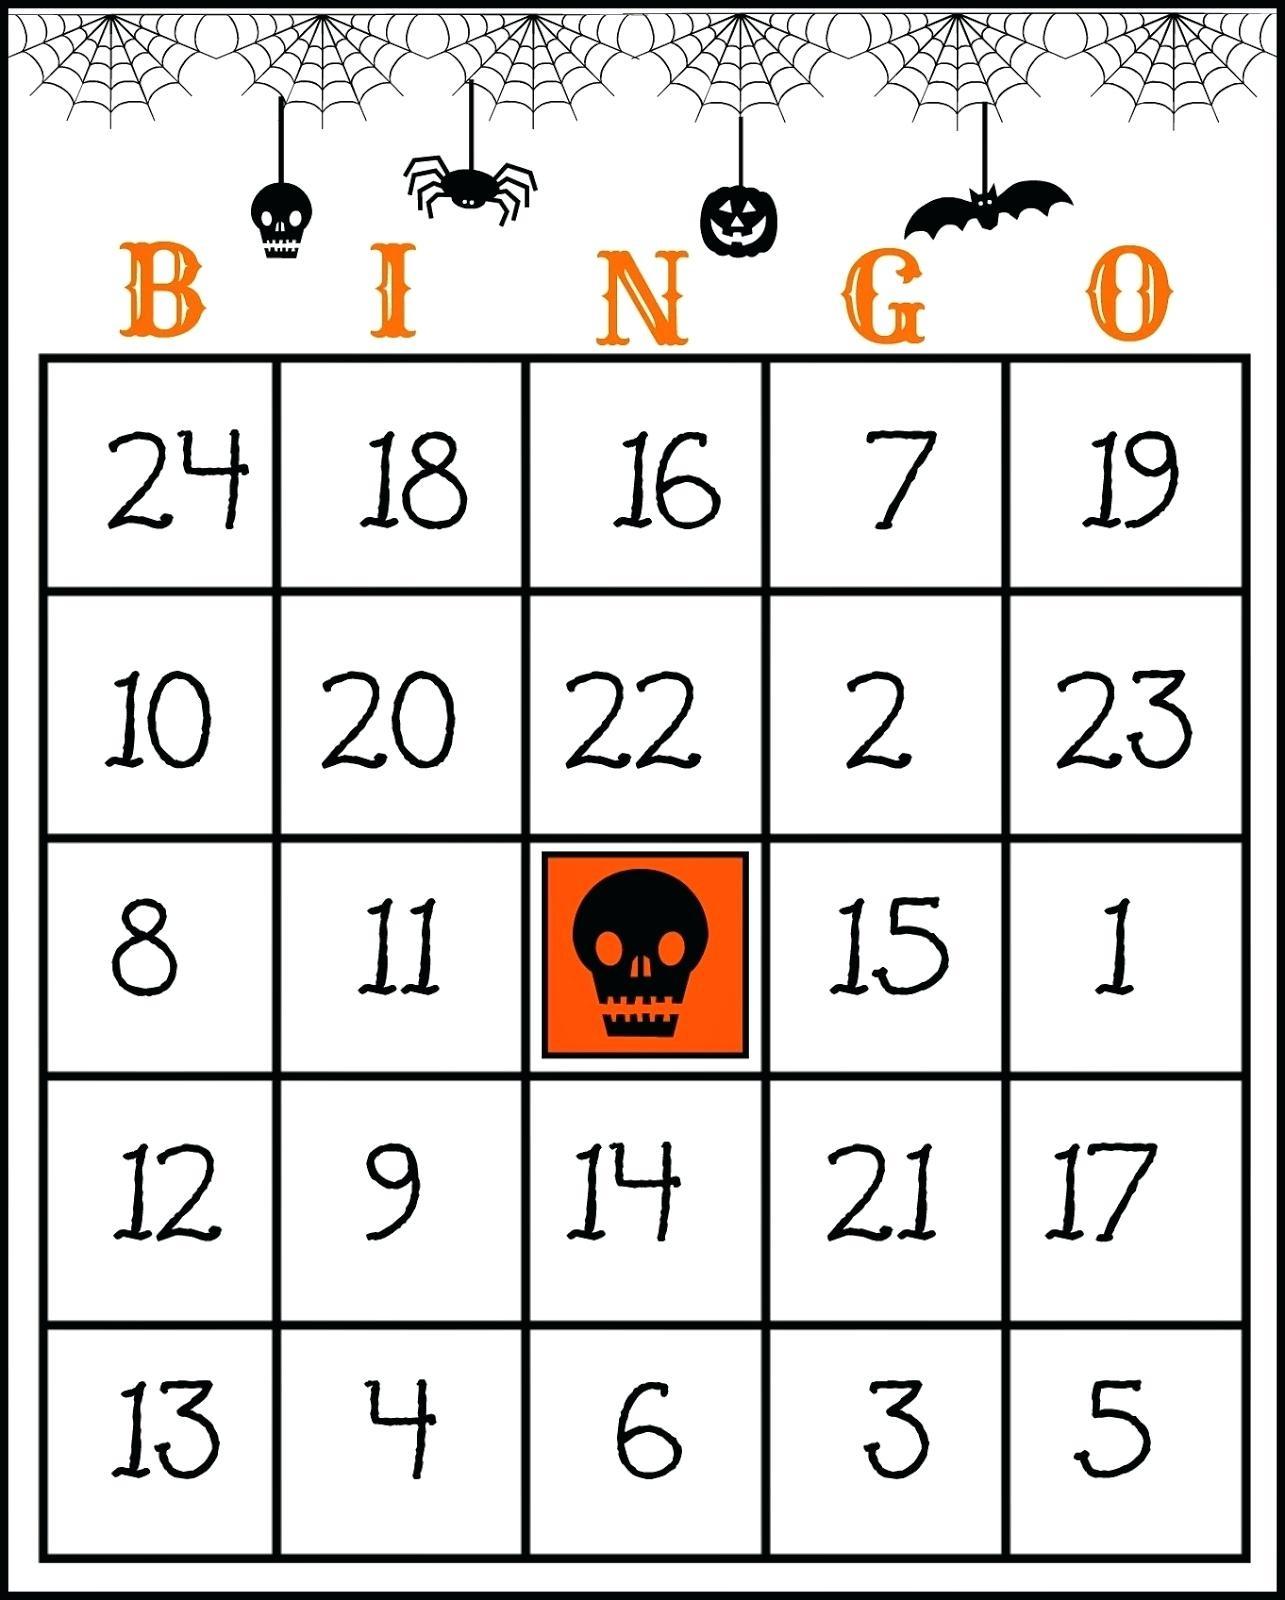 Maths Bingo Free Multiplication Games For Kids Printable Times - Math Bingo Free Printable